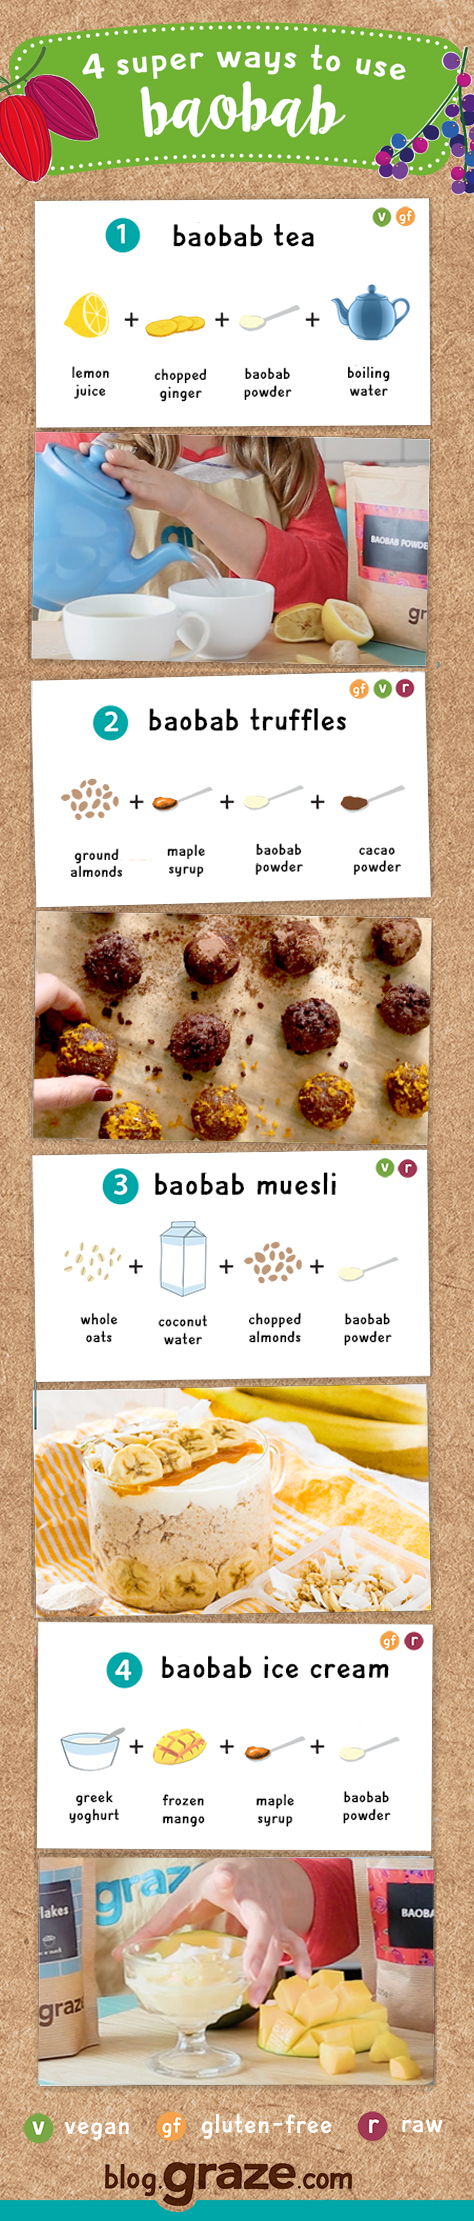 4 ways to use baobab | Gluten free blogs, Graze snacks ...